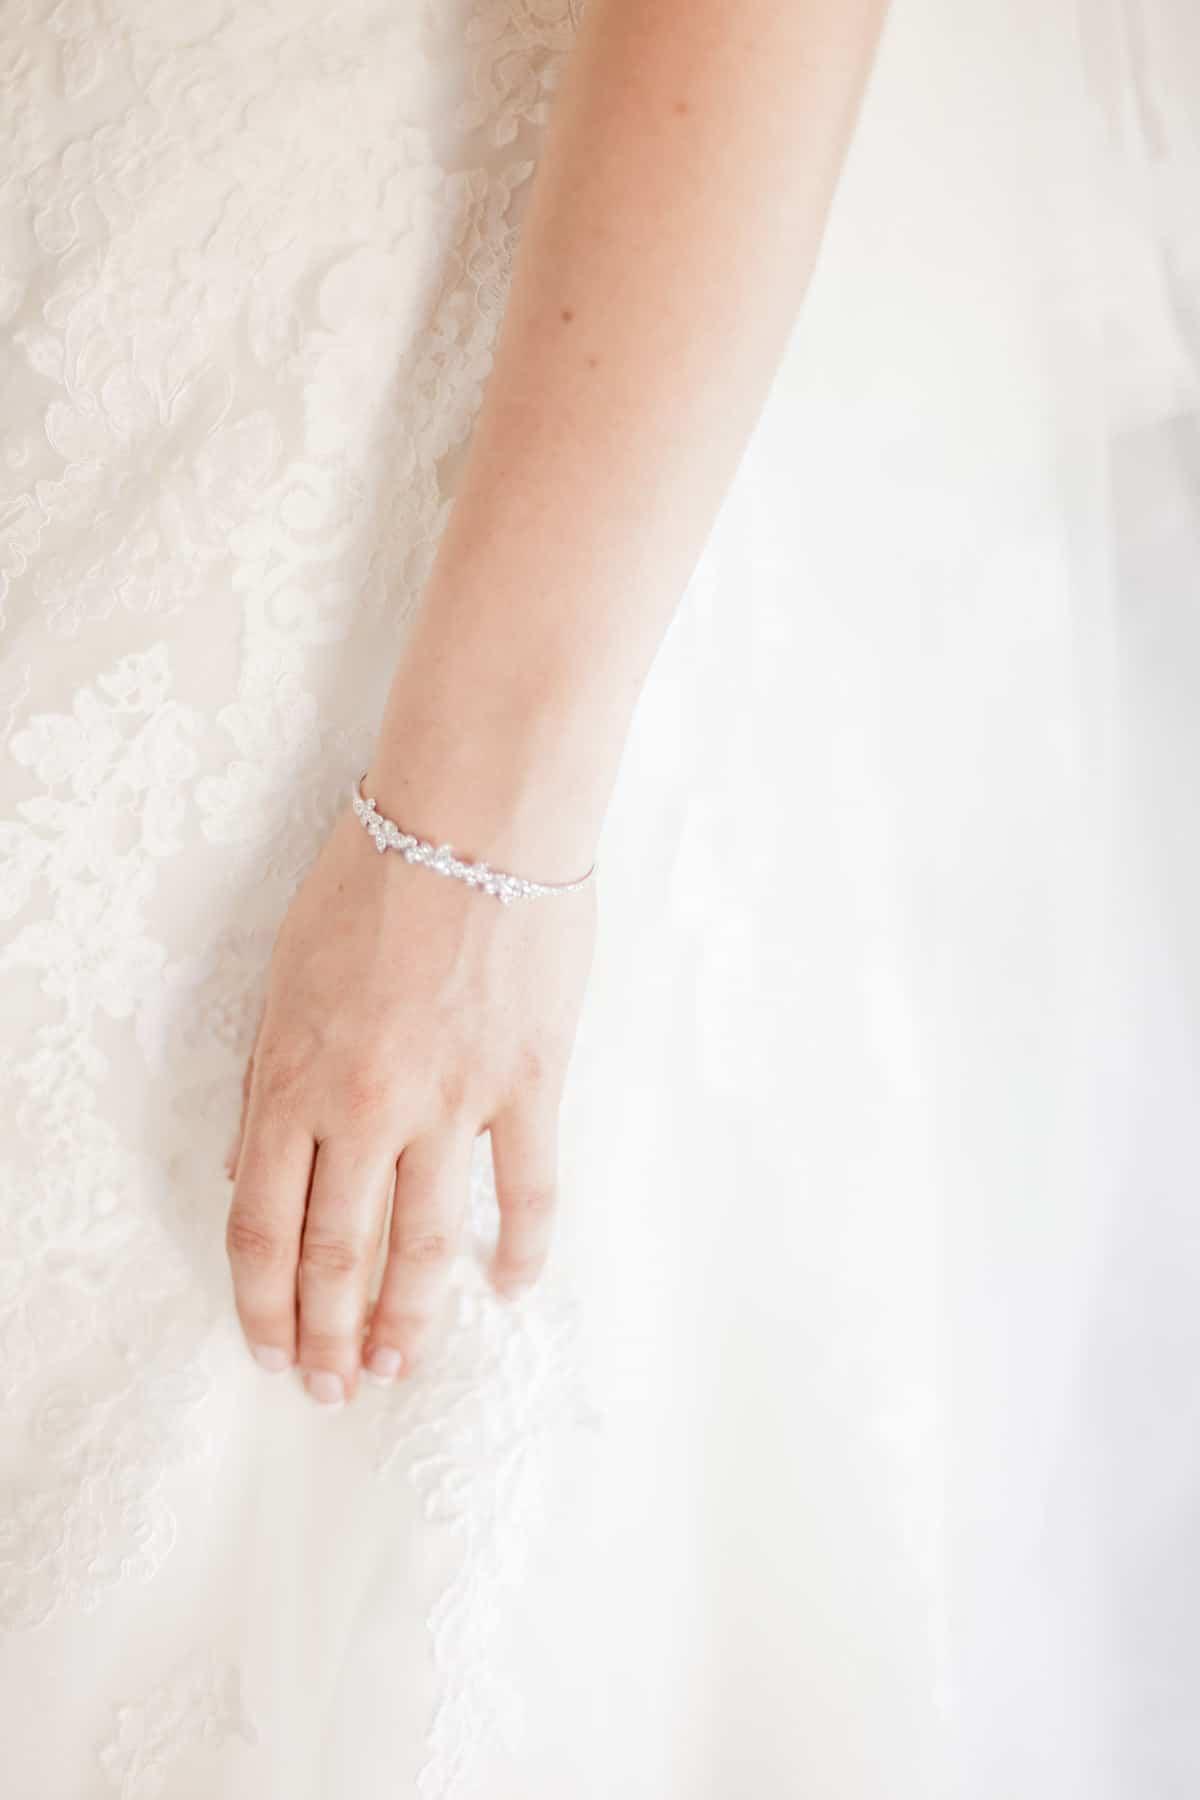 photographe mariage bordeaux landes fineart francais sarah miramon blog 04